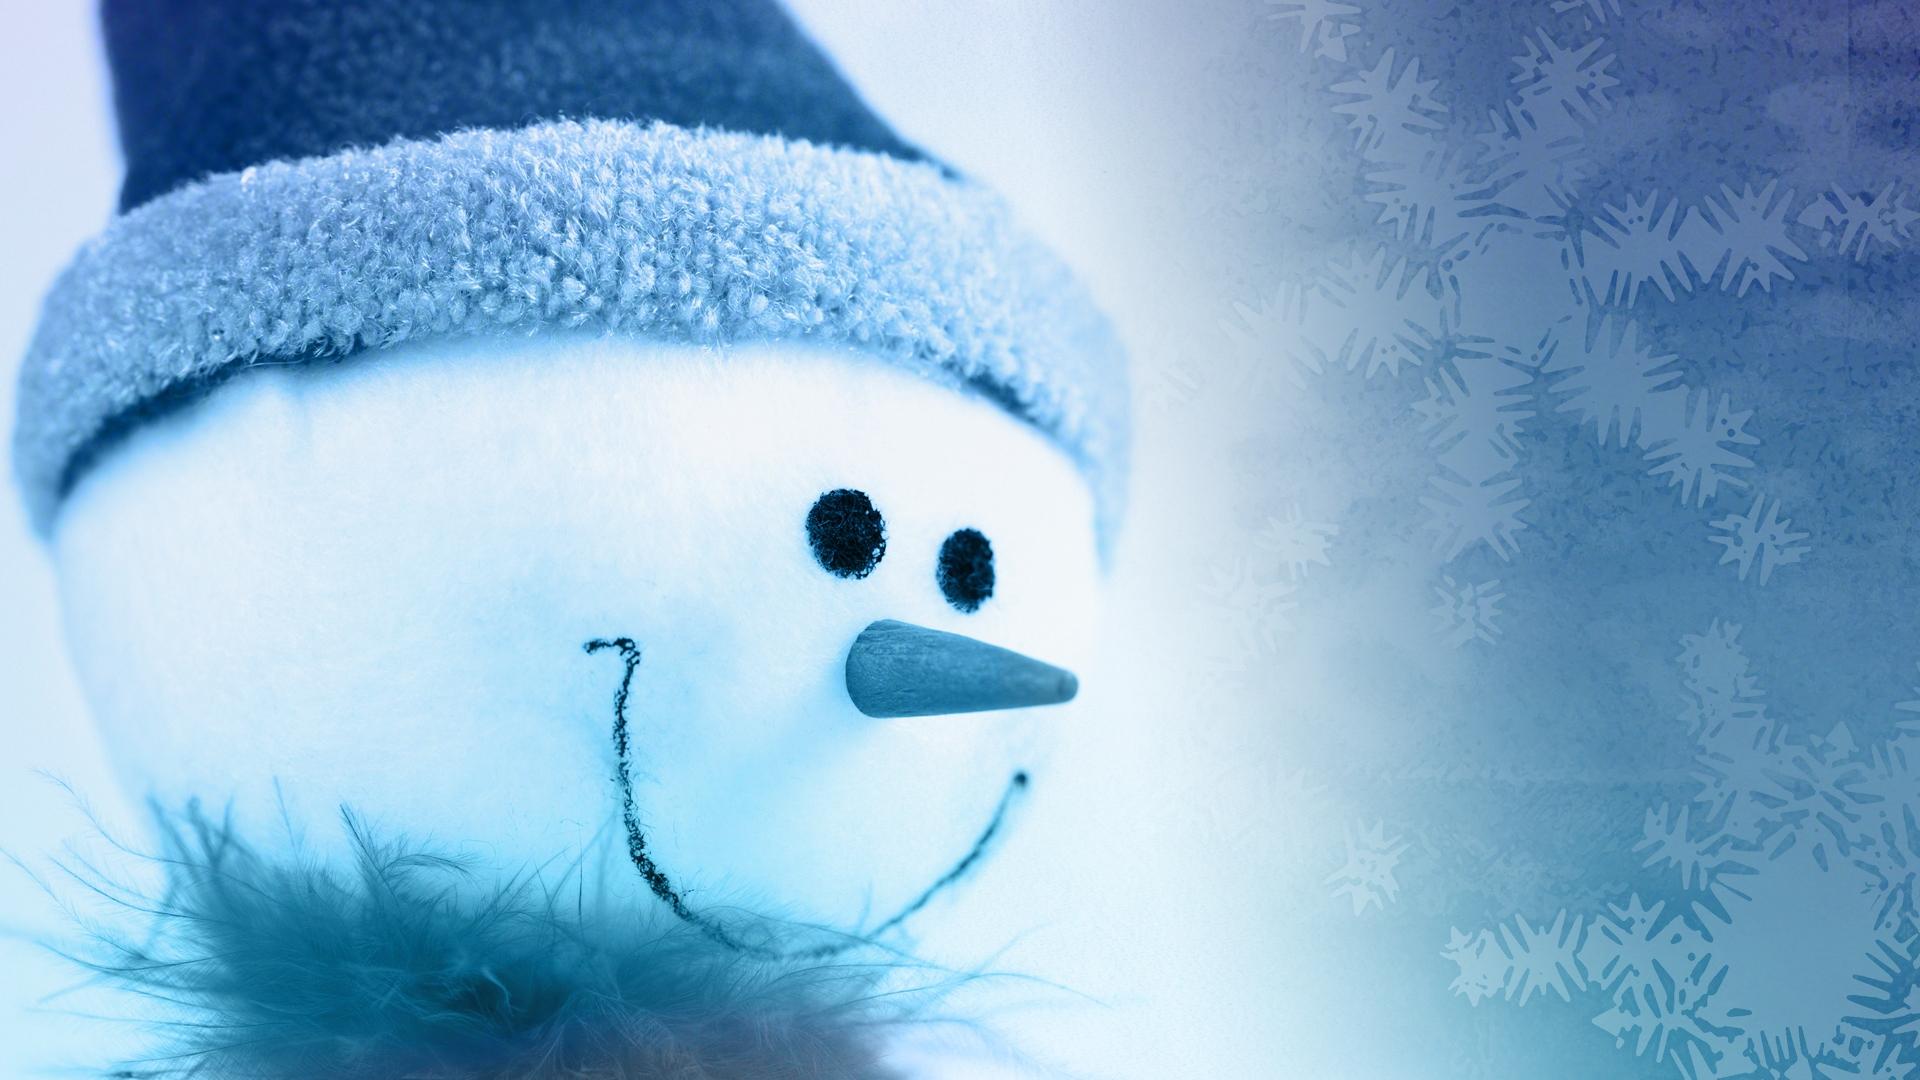 snowman wallpaper 4169